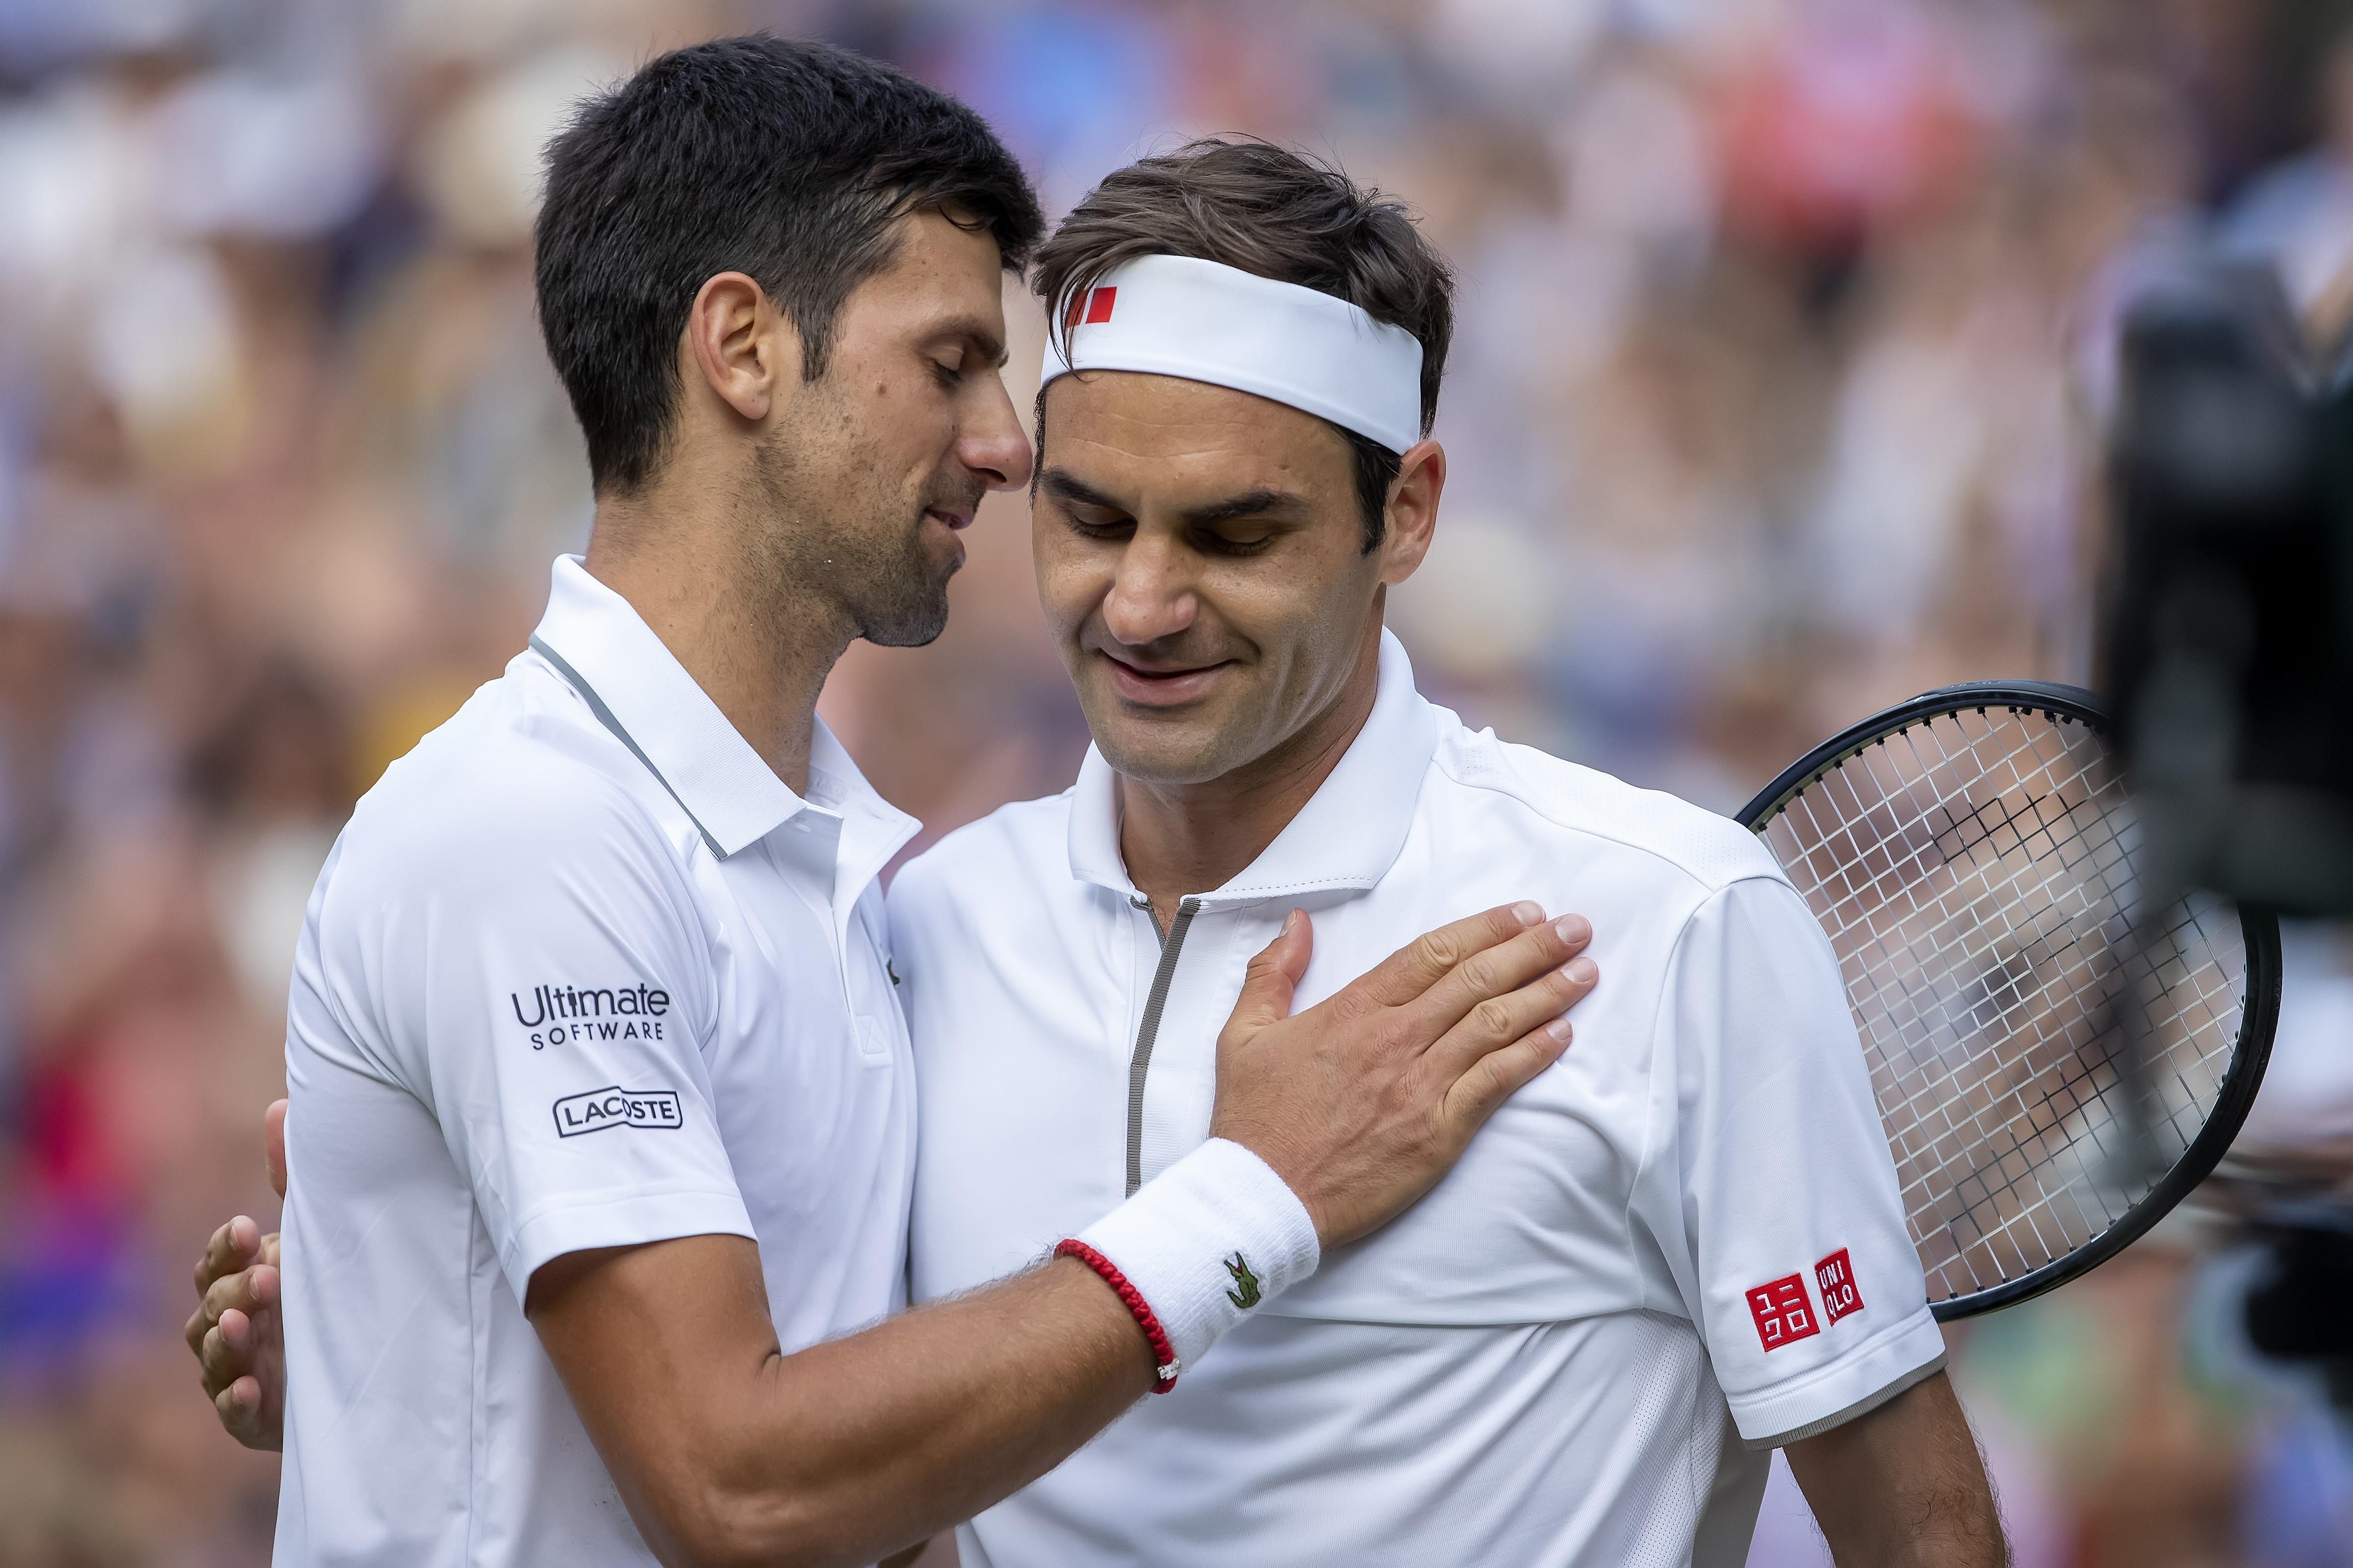 Novak Djokovic & Roger Federer (2019 Wimbledon)